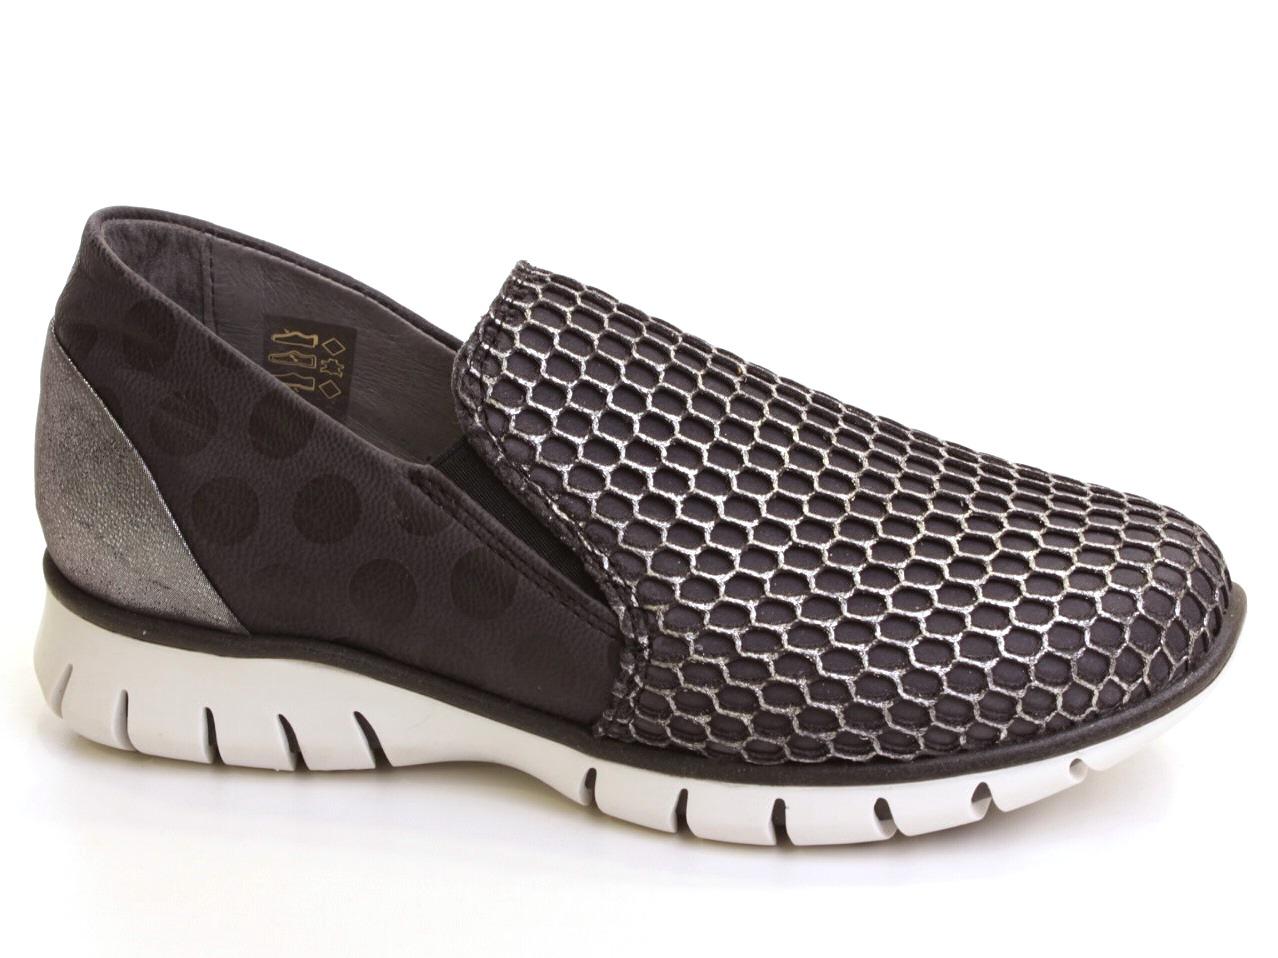 Sneakers and Espadrilles Felmini - 488 9488